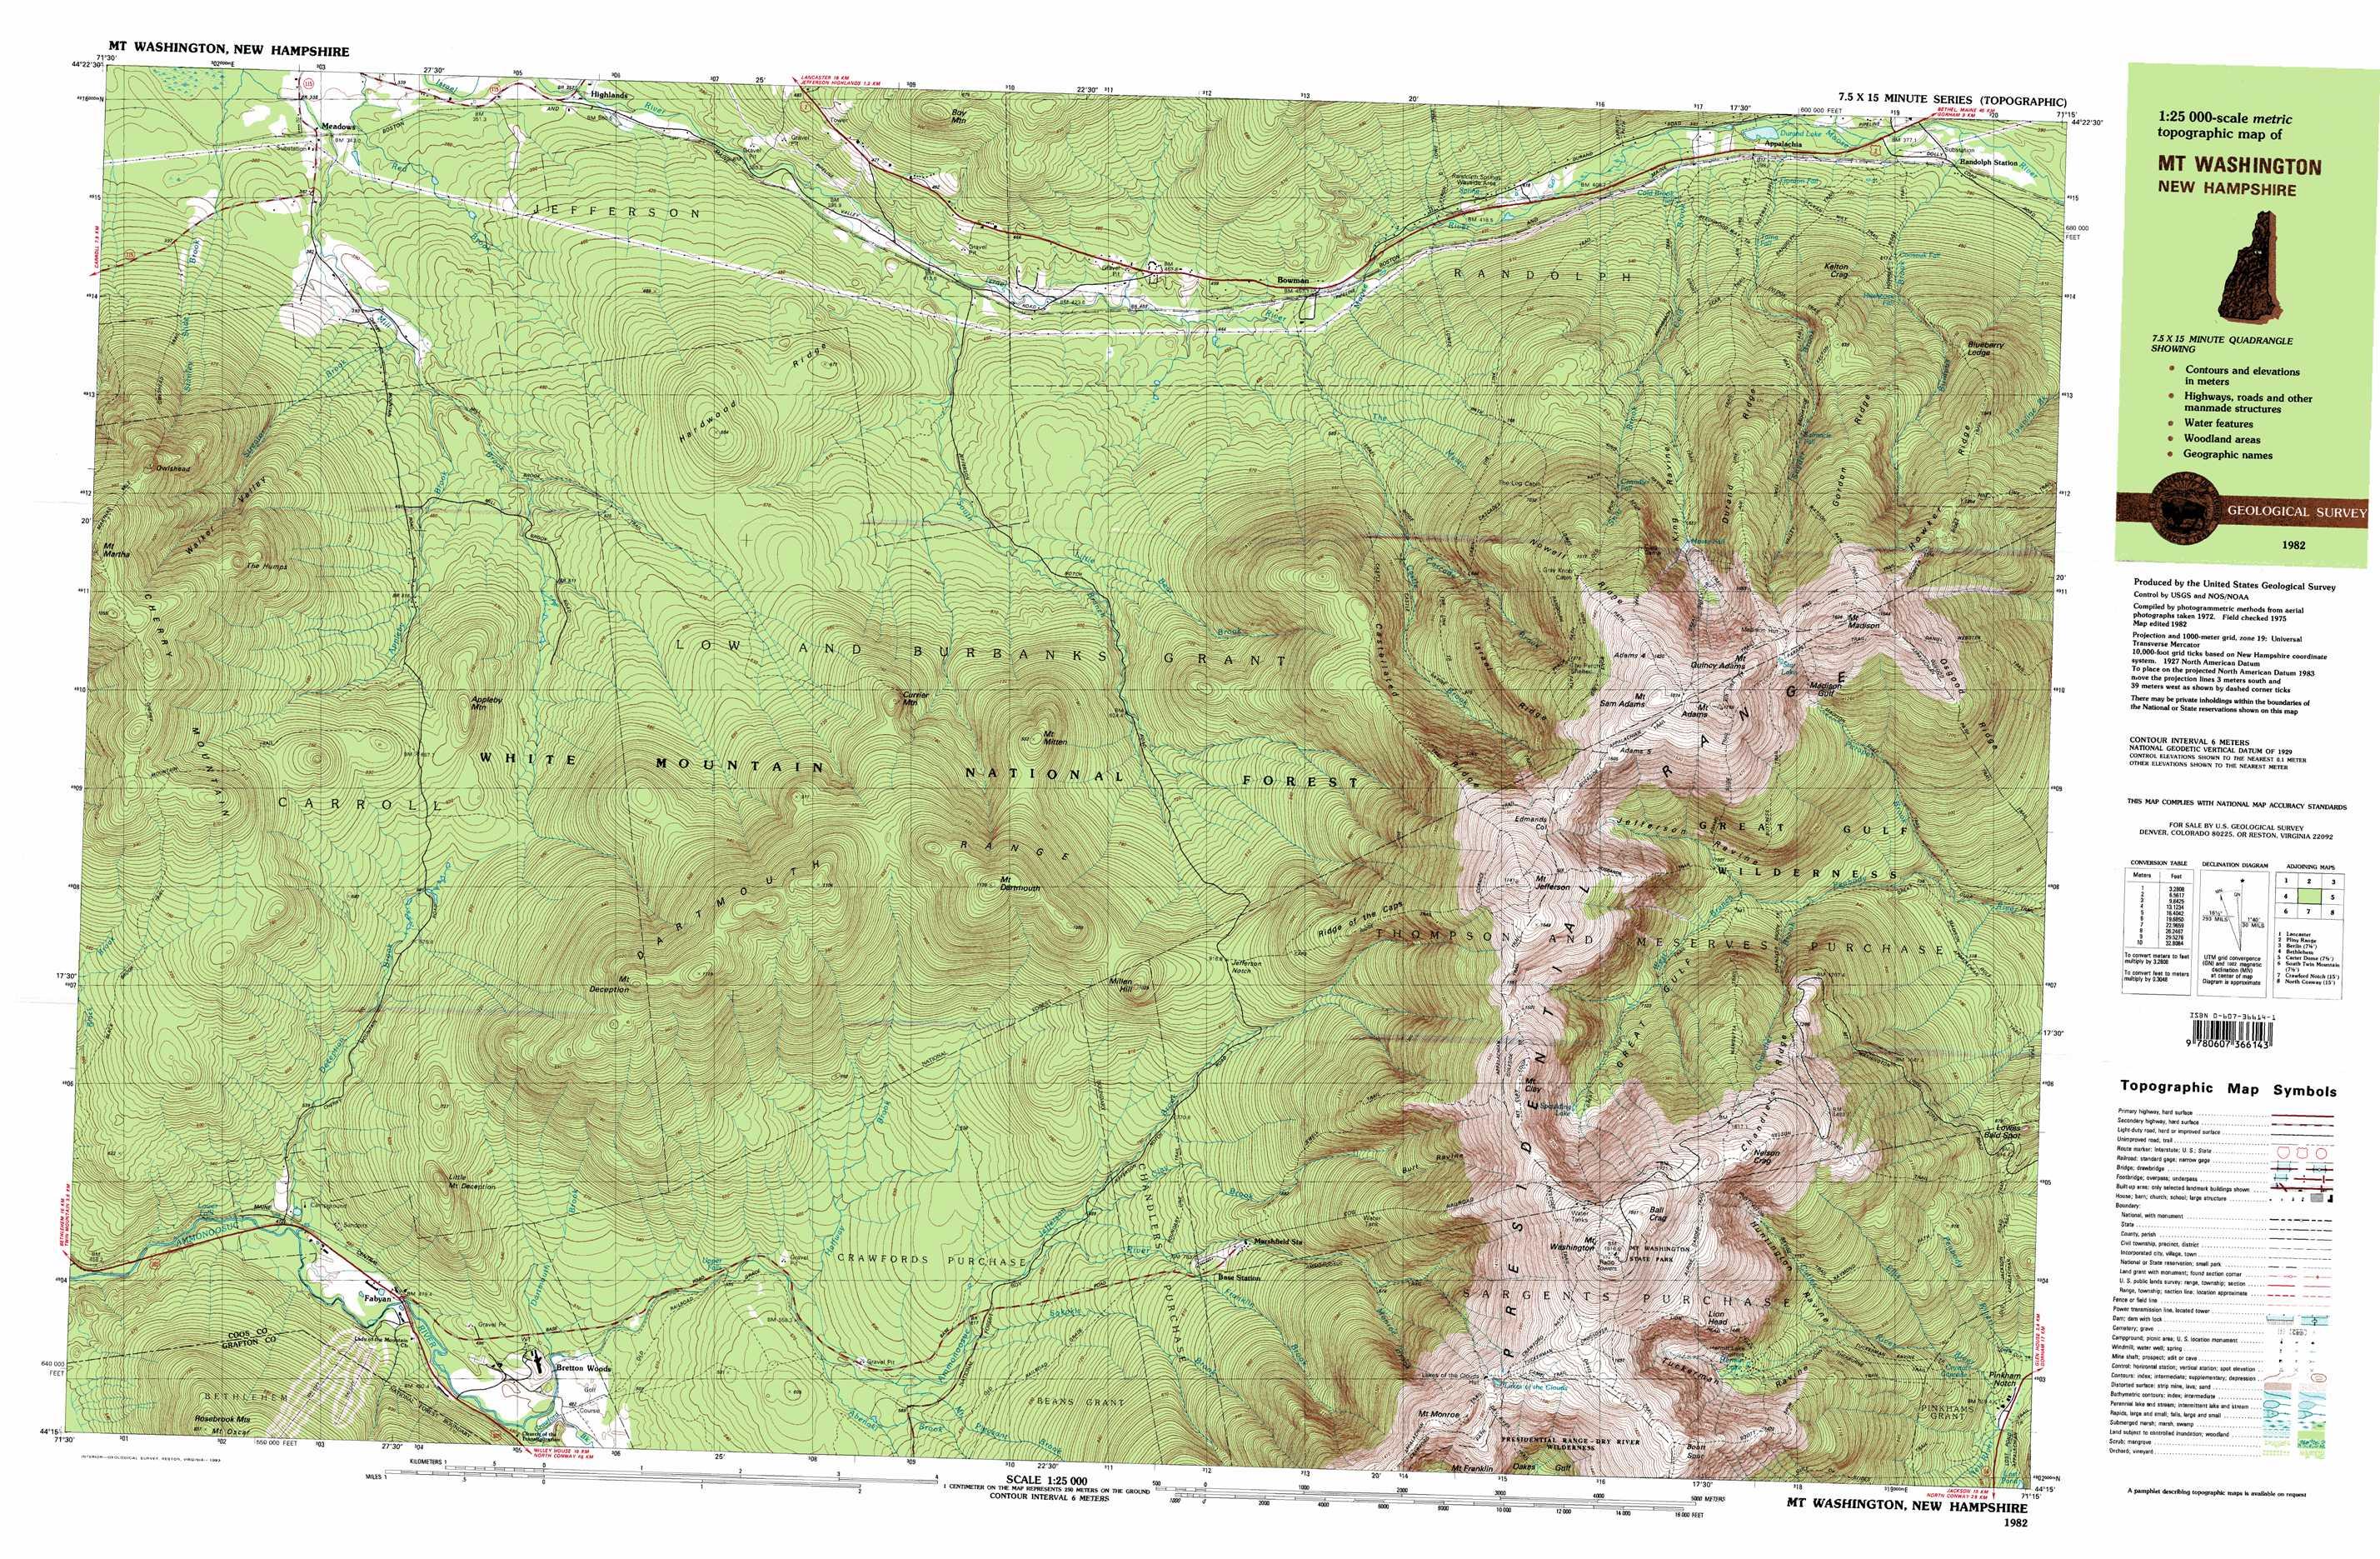 Mount Washington Topographic Map NH USGS Topo Quad C - Topographic map of us mountain ranges